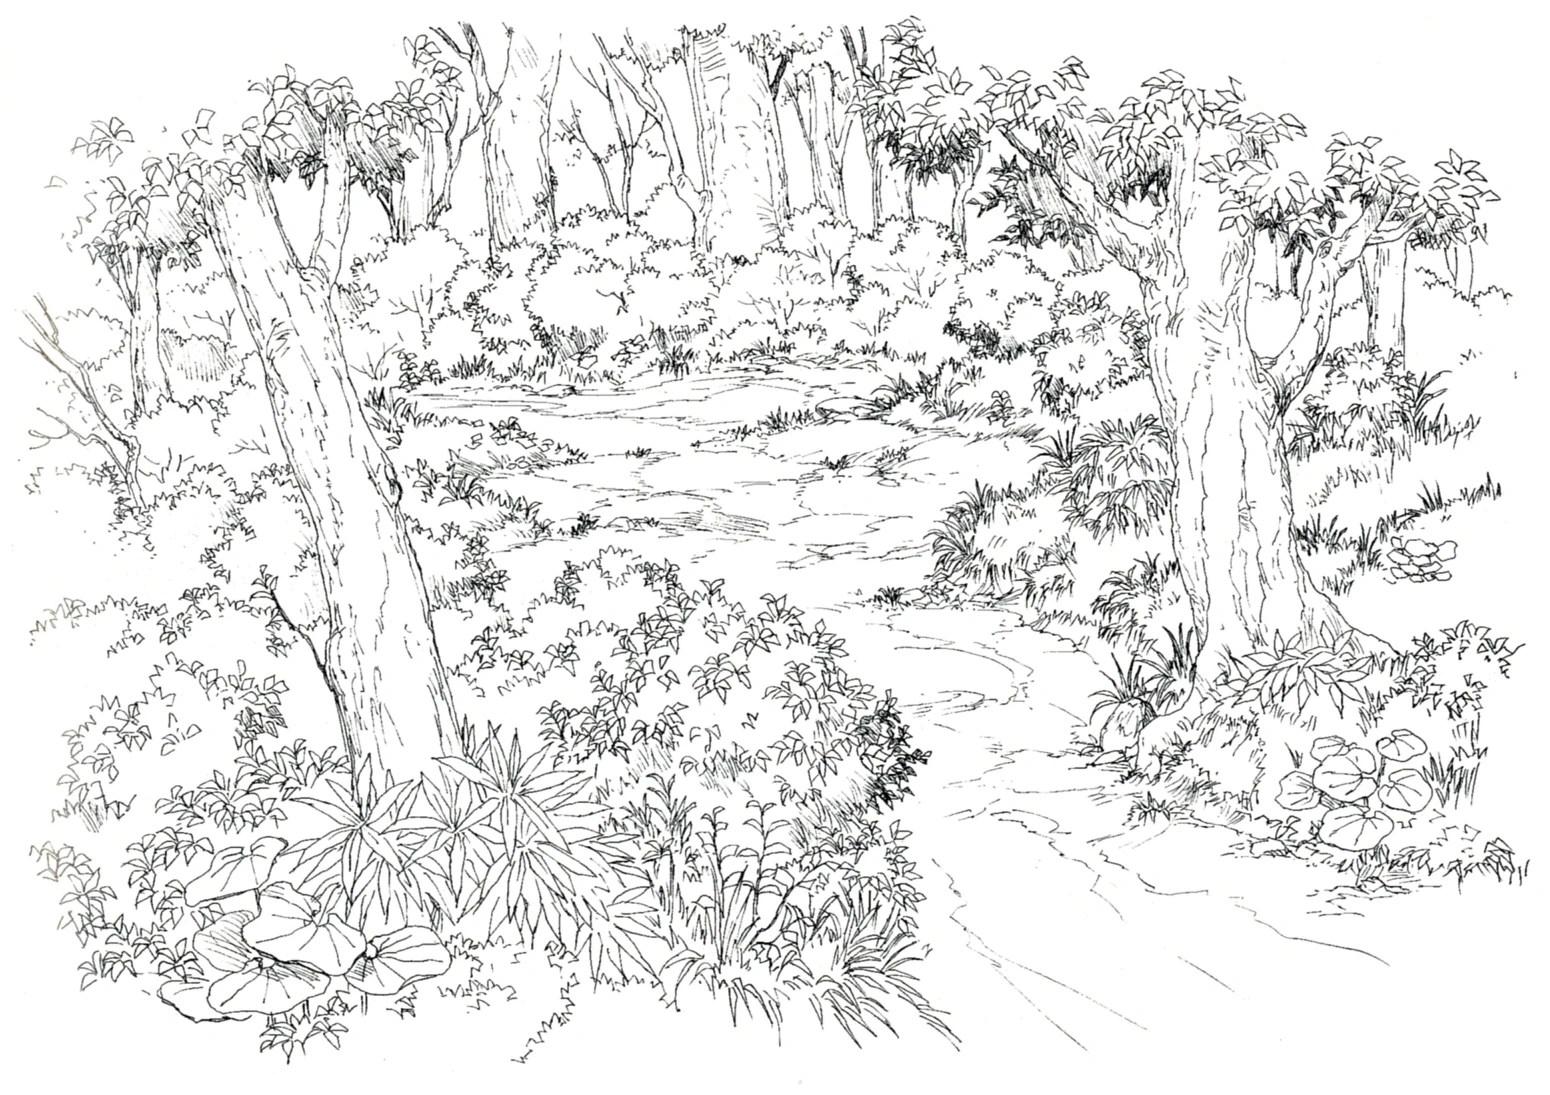 Chocobo Forest Final Fantasy Viii